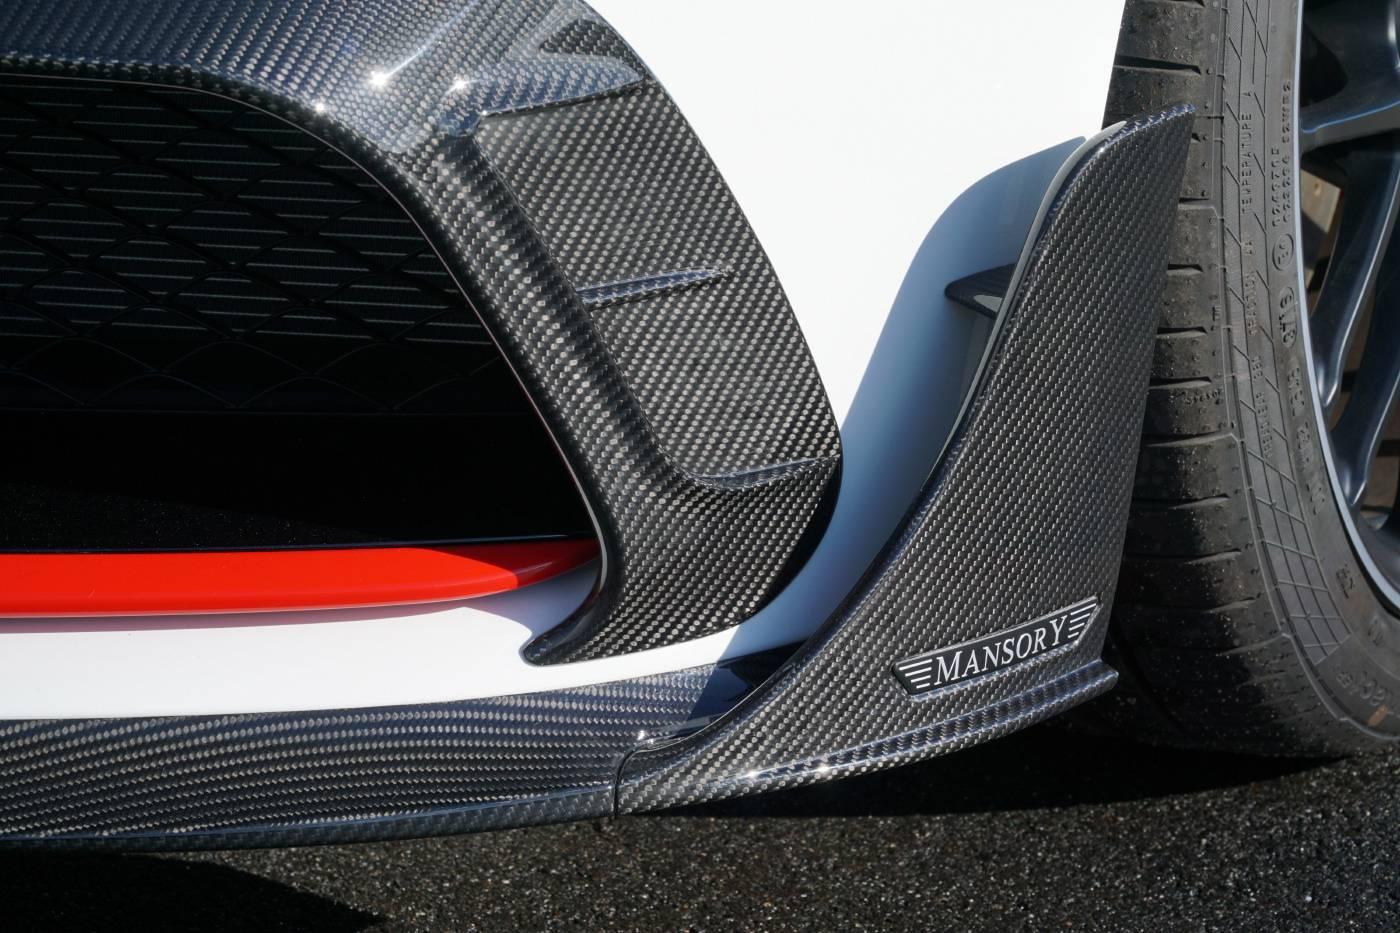 Mansory установили новый комплект расширения кузова из карбона, который включает тонкий передний сплиттер, накладки на бампера, задний диффузор, накладки на пороги и корпуса зеркал.